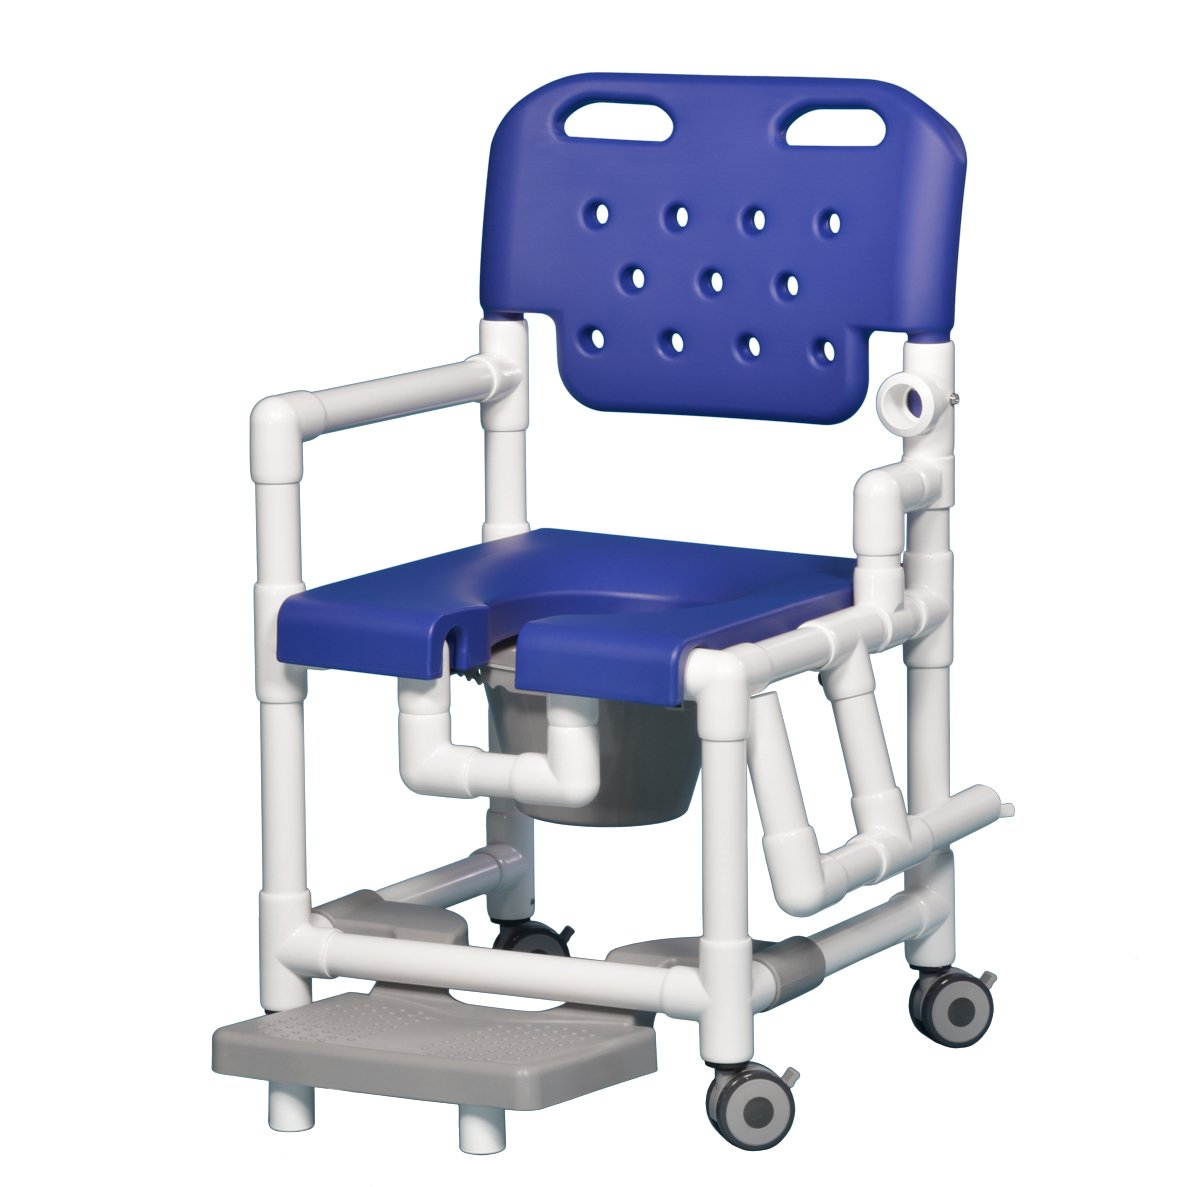 Elite Shower Chair Commode with Footrest and Left Drop Arm ELT817 P FRLDA (Blue)